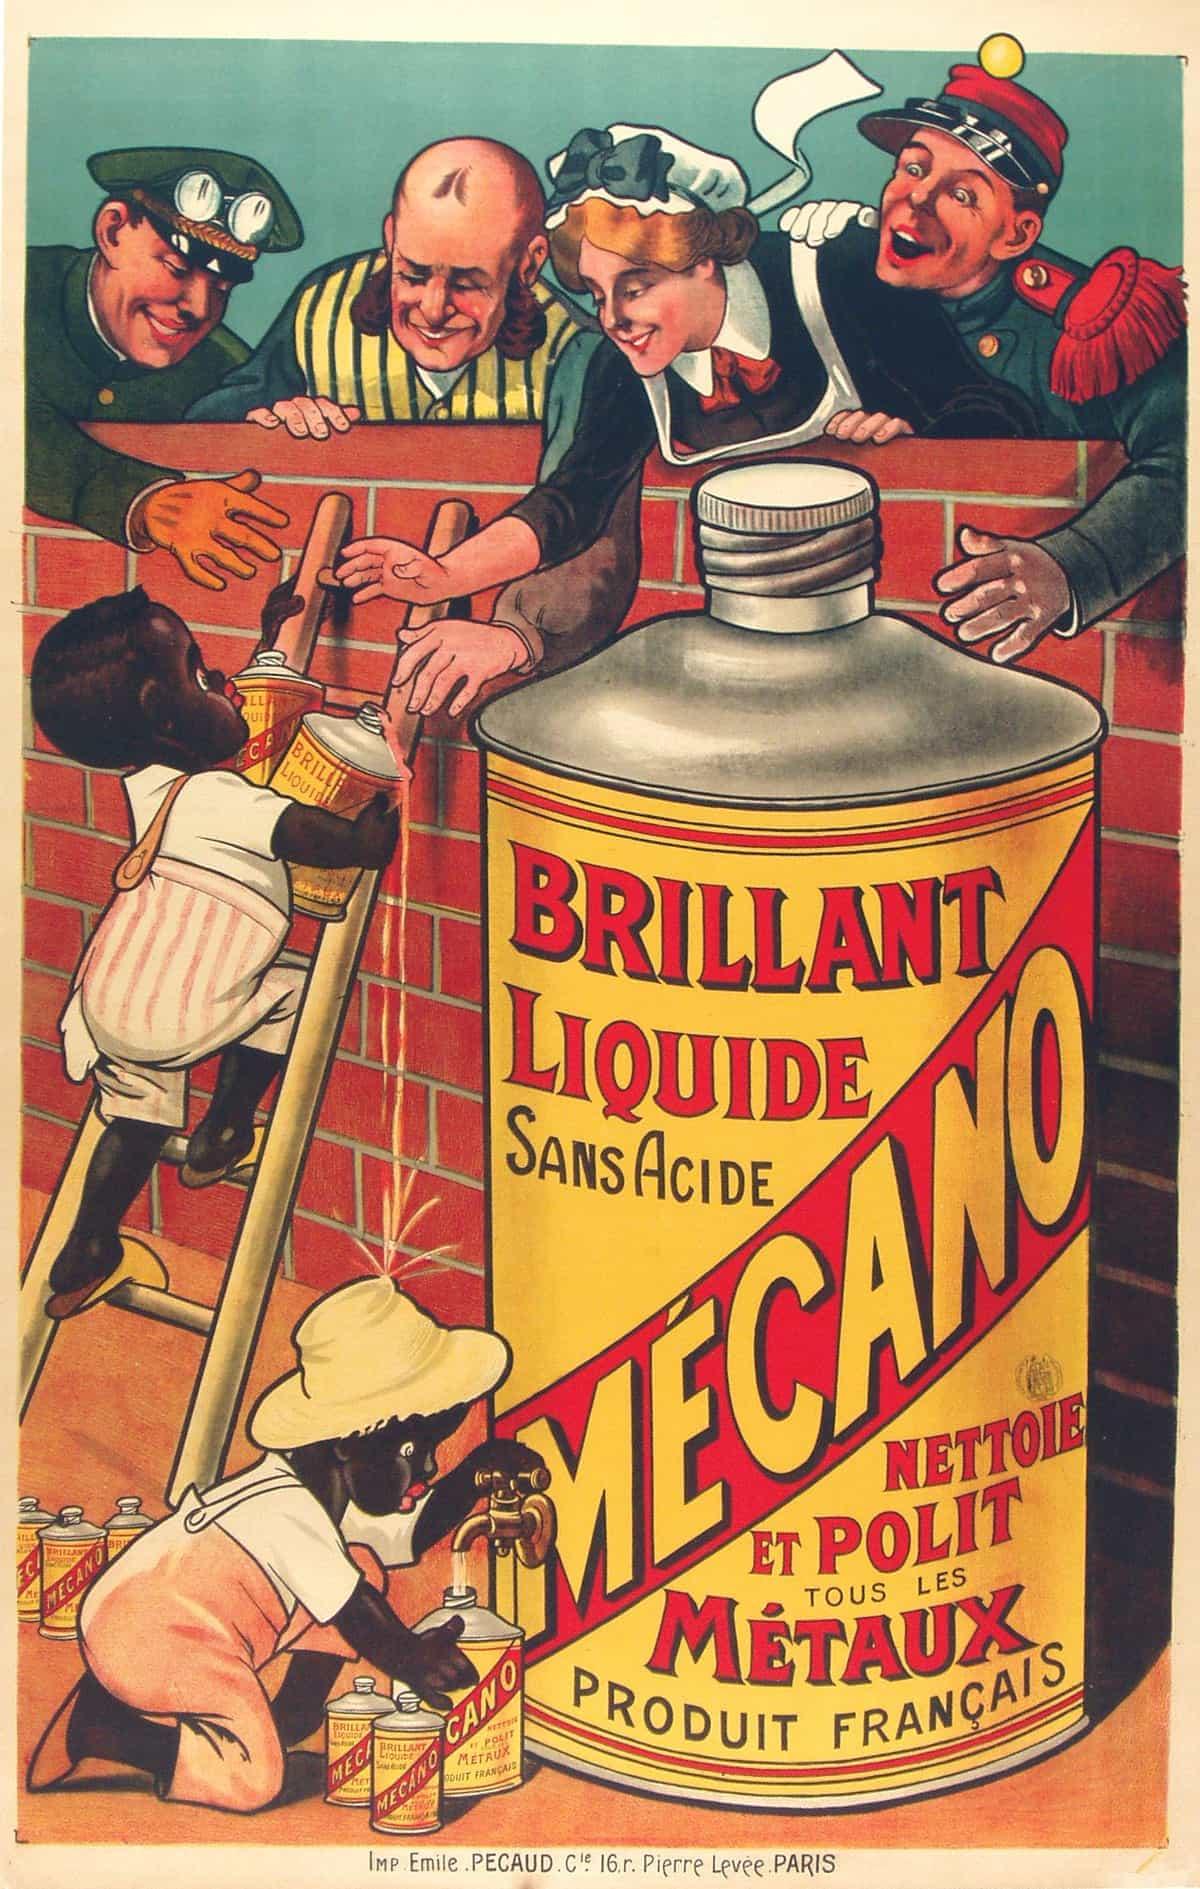 Polishing Brillant Liquide Mecano Vintage Advert Poster